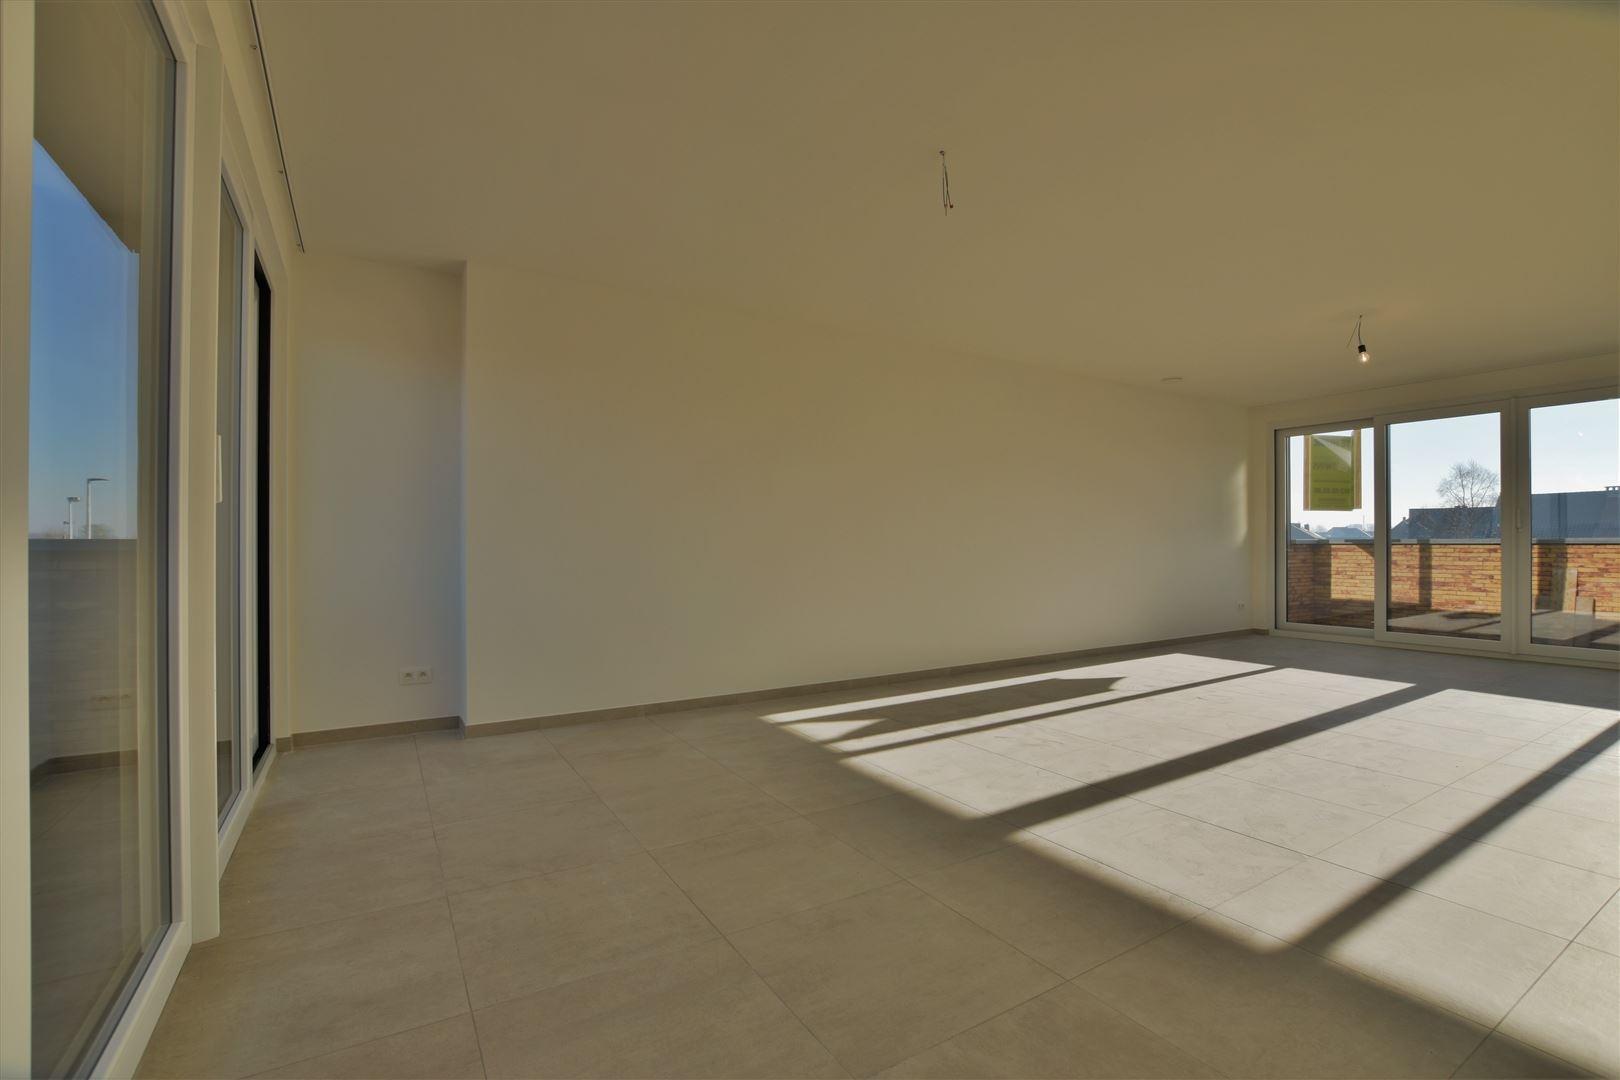 Foto 9 : Duplex/Penthouse te 9200 APPELS (België) - Prijs € 800